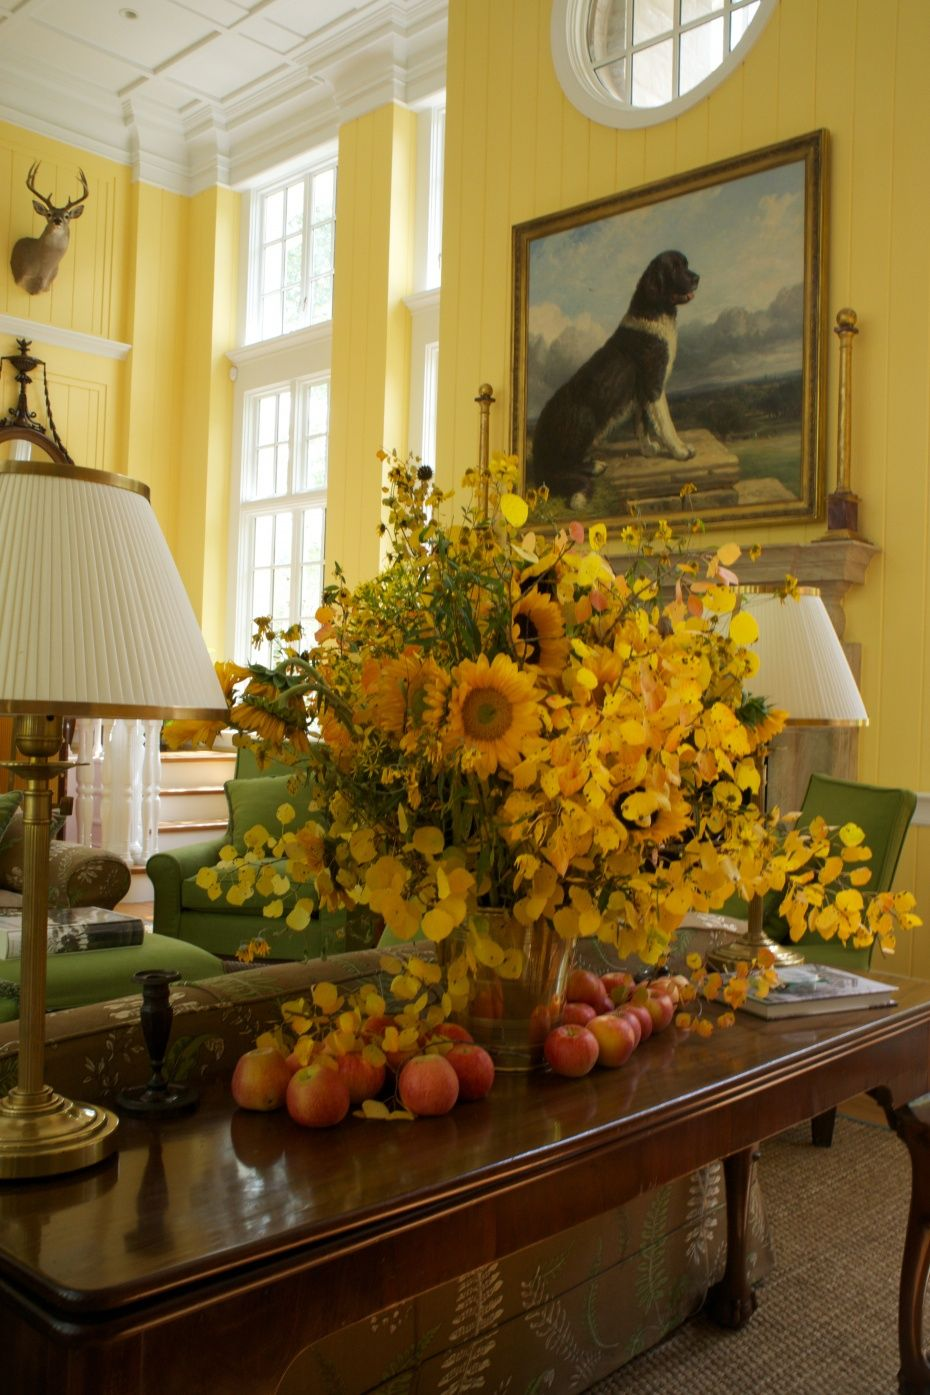 Summertime slipcovers   Buttercup Cottage   Pinterest   Living rooms ...